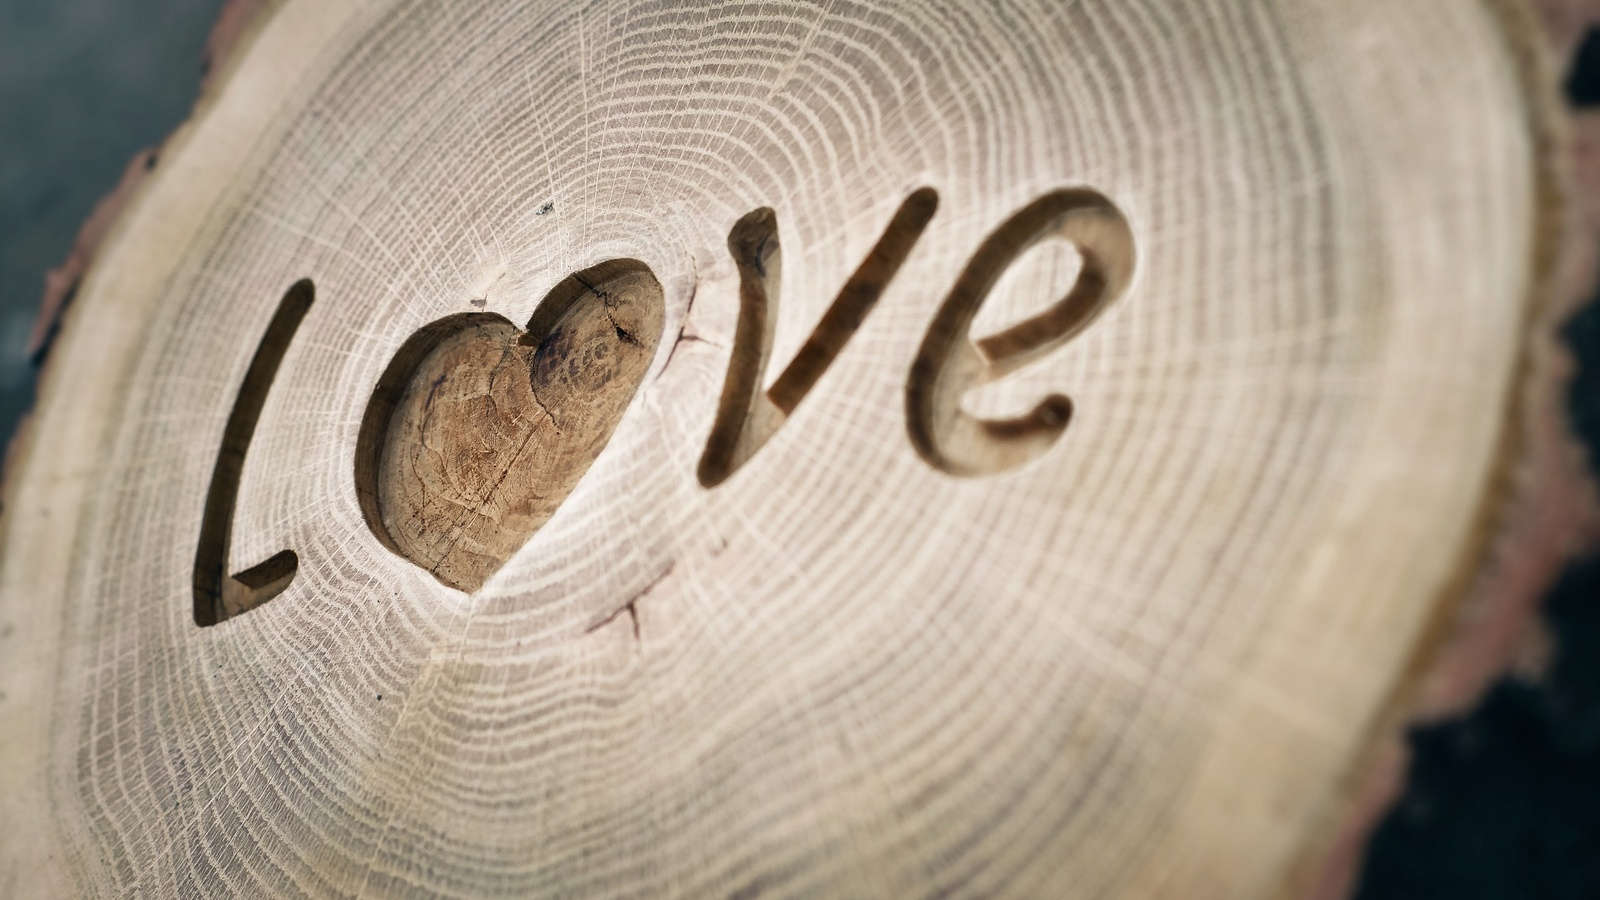 1600x900 love written on wood 1600x900 resolution hd 4k wallpapers love written on wood wideg thecheapjerseys Choice Image